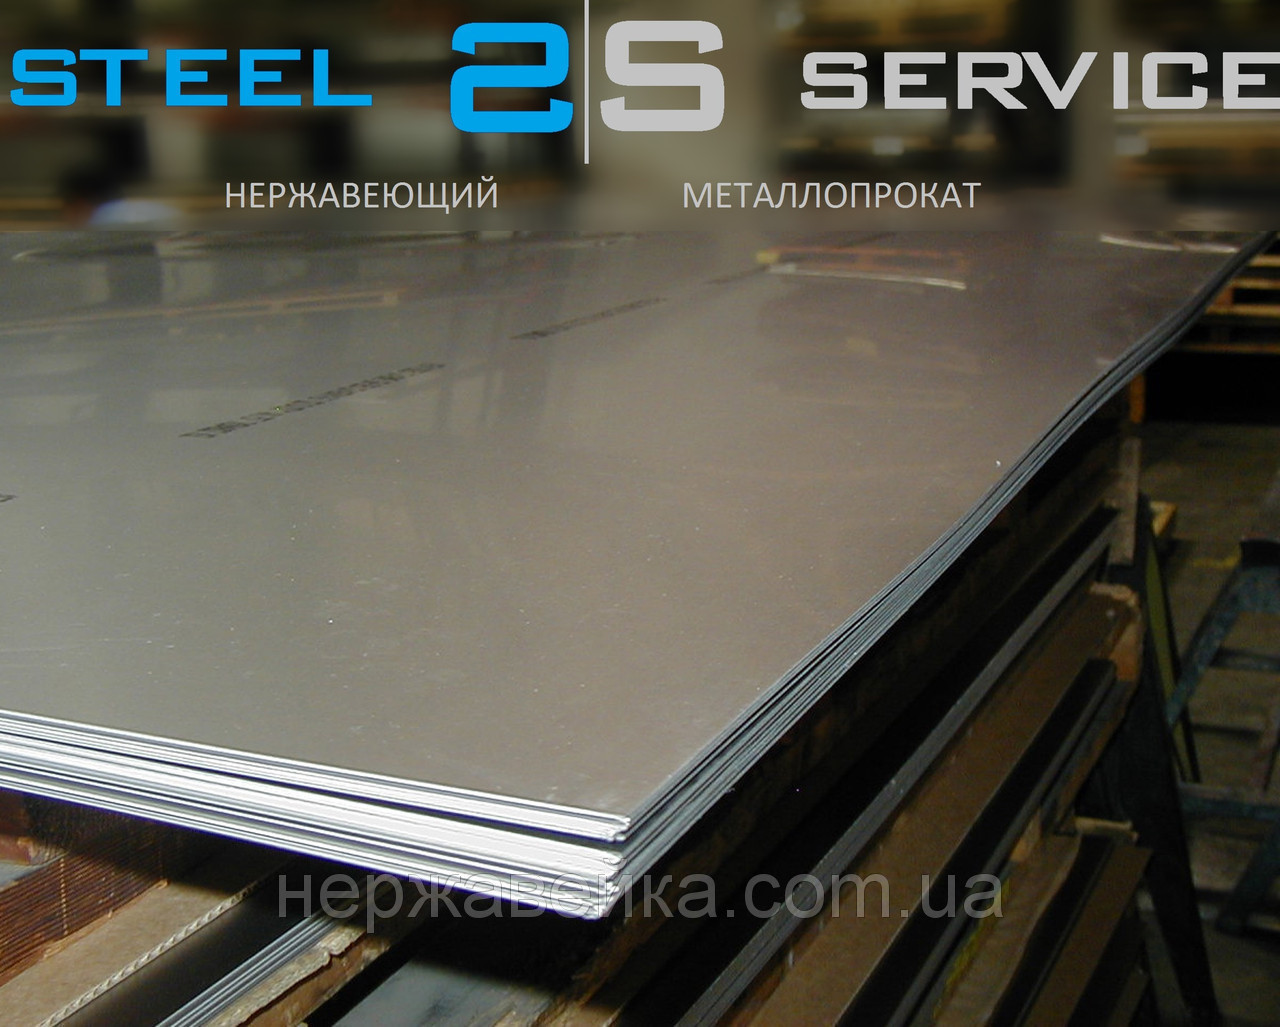 Нержавеющий лист 1,5х1250х2500мм  AISI 316L(03Х17Н14М3) 2B - матовый,  кислотостойкий